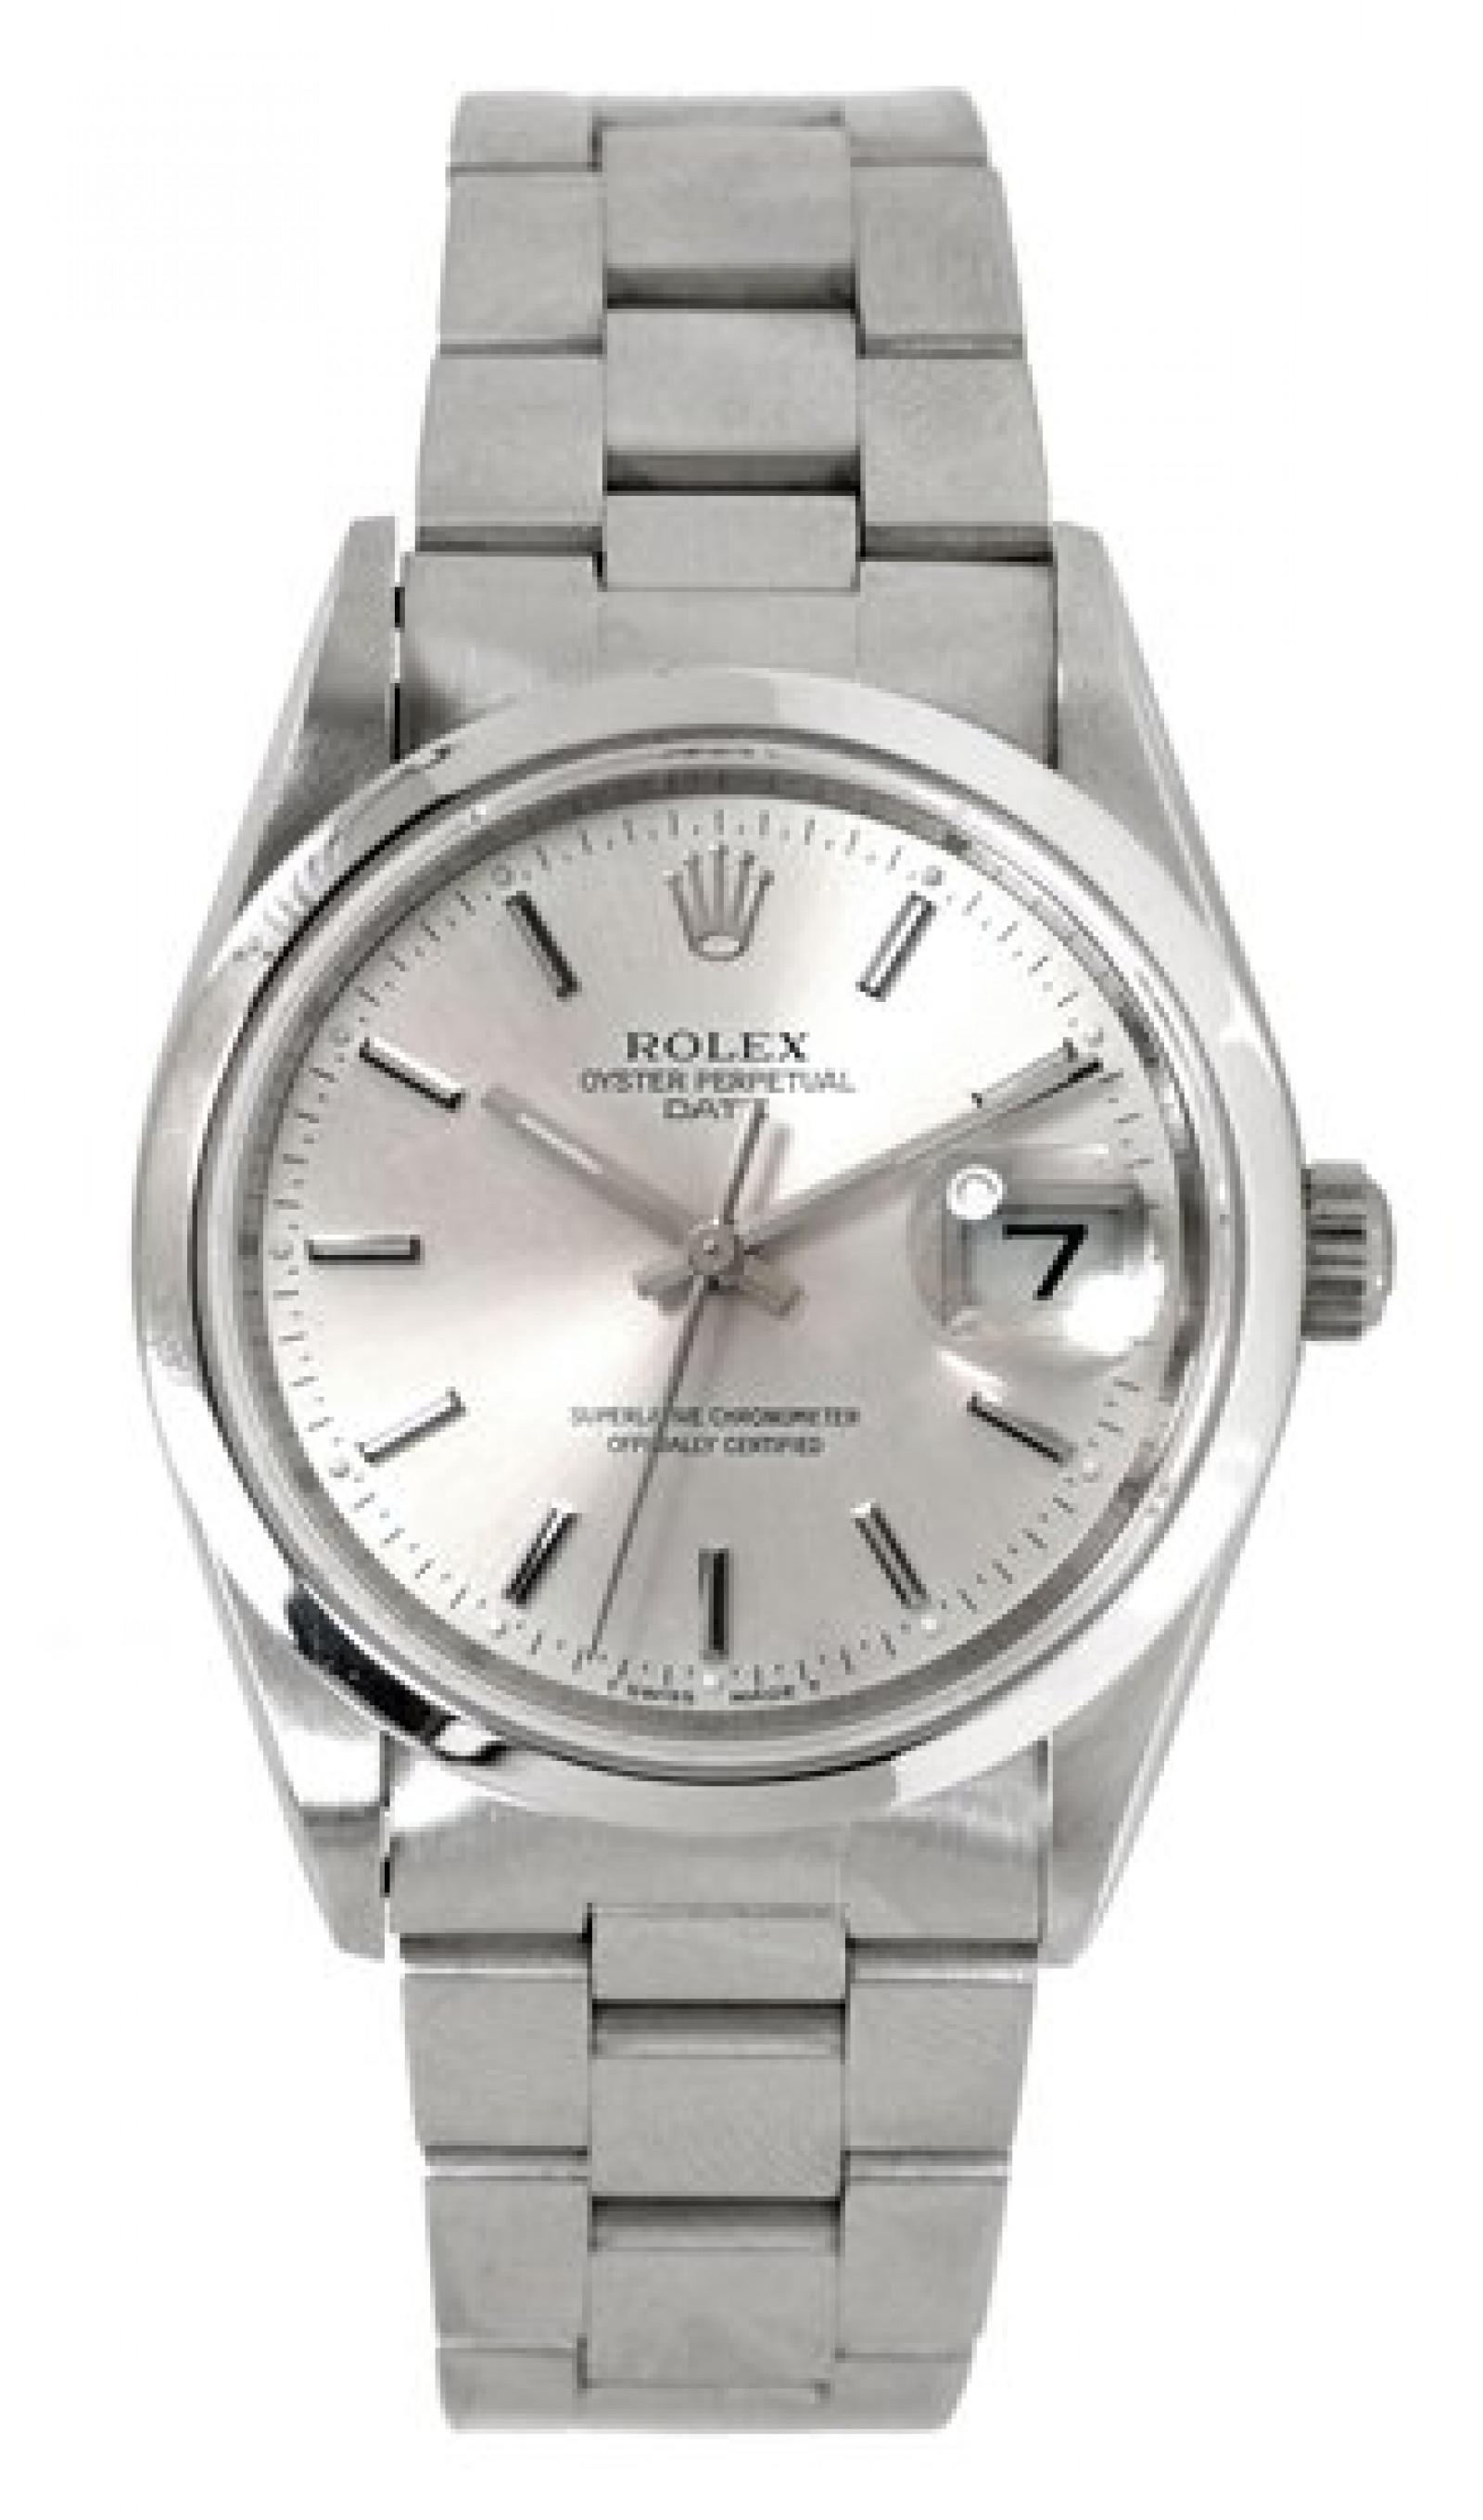 Rolex Date 15200 Steel Silver Dial 1996